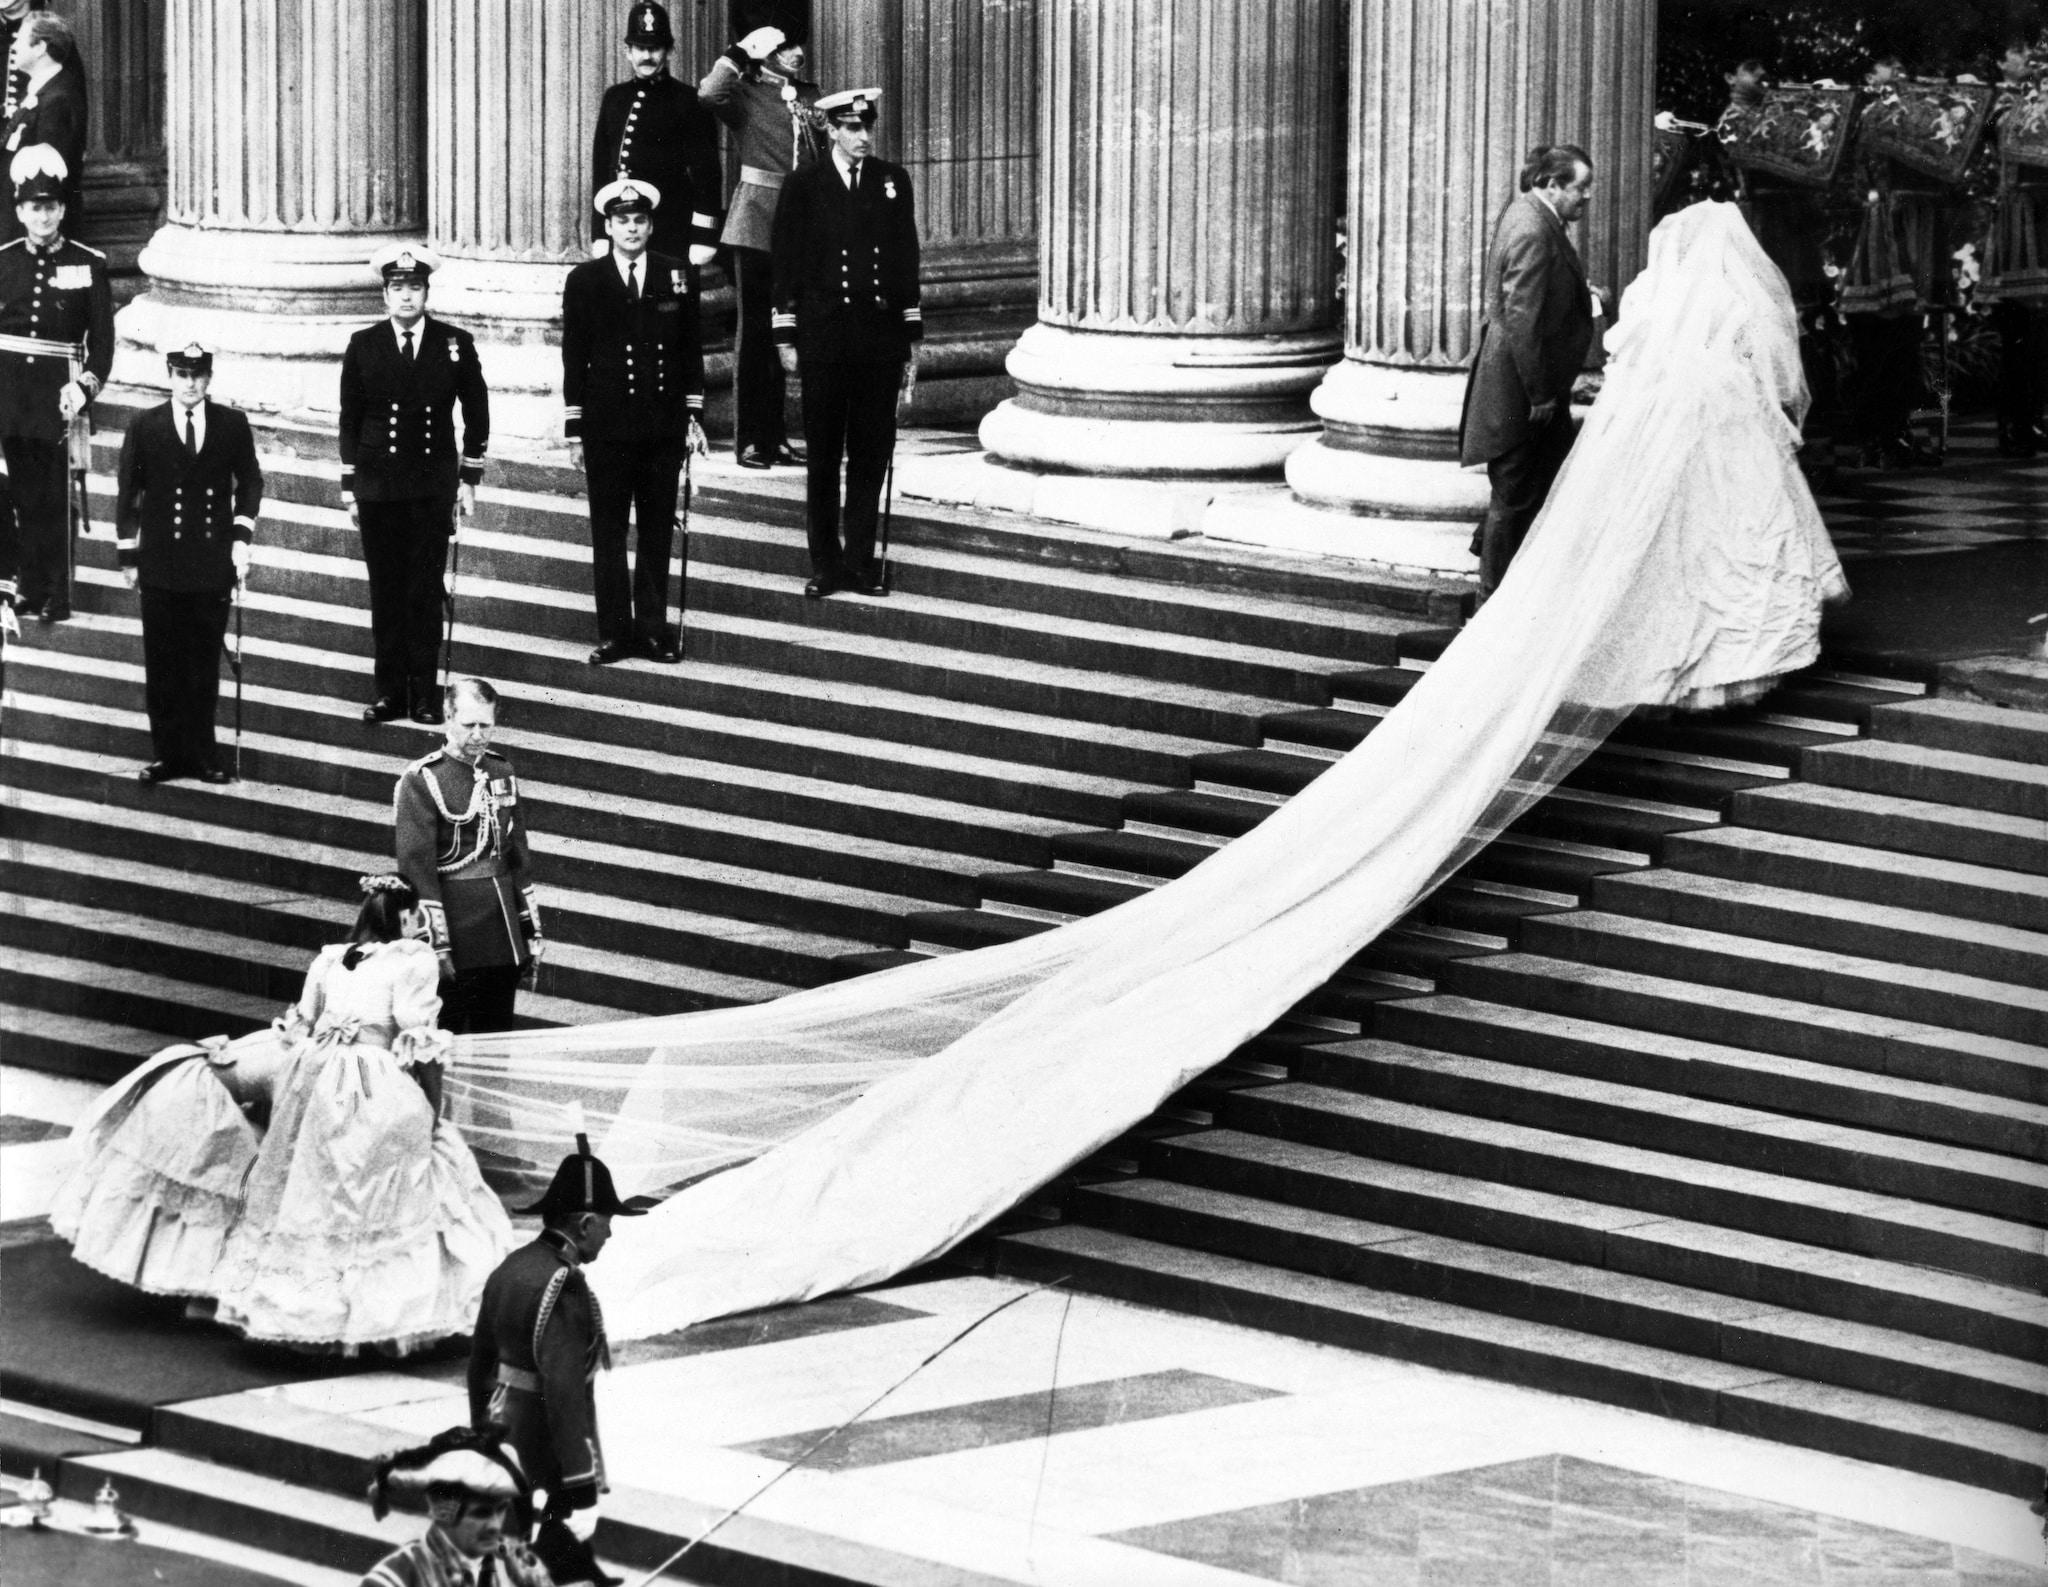 matrimonio di Diana Spencer e Carlo d'Inghilterra